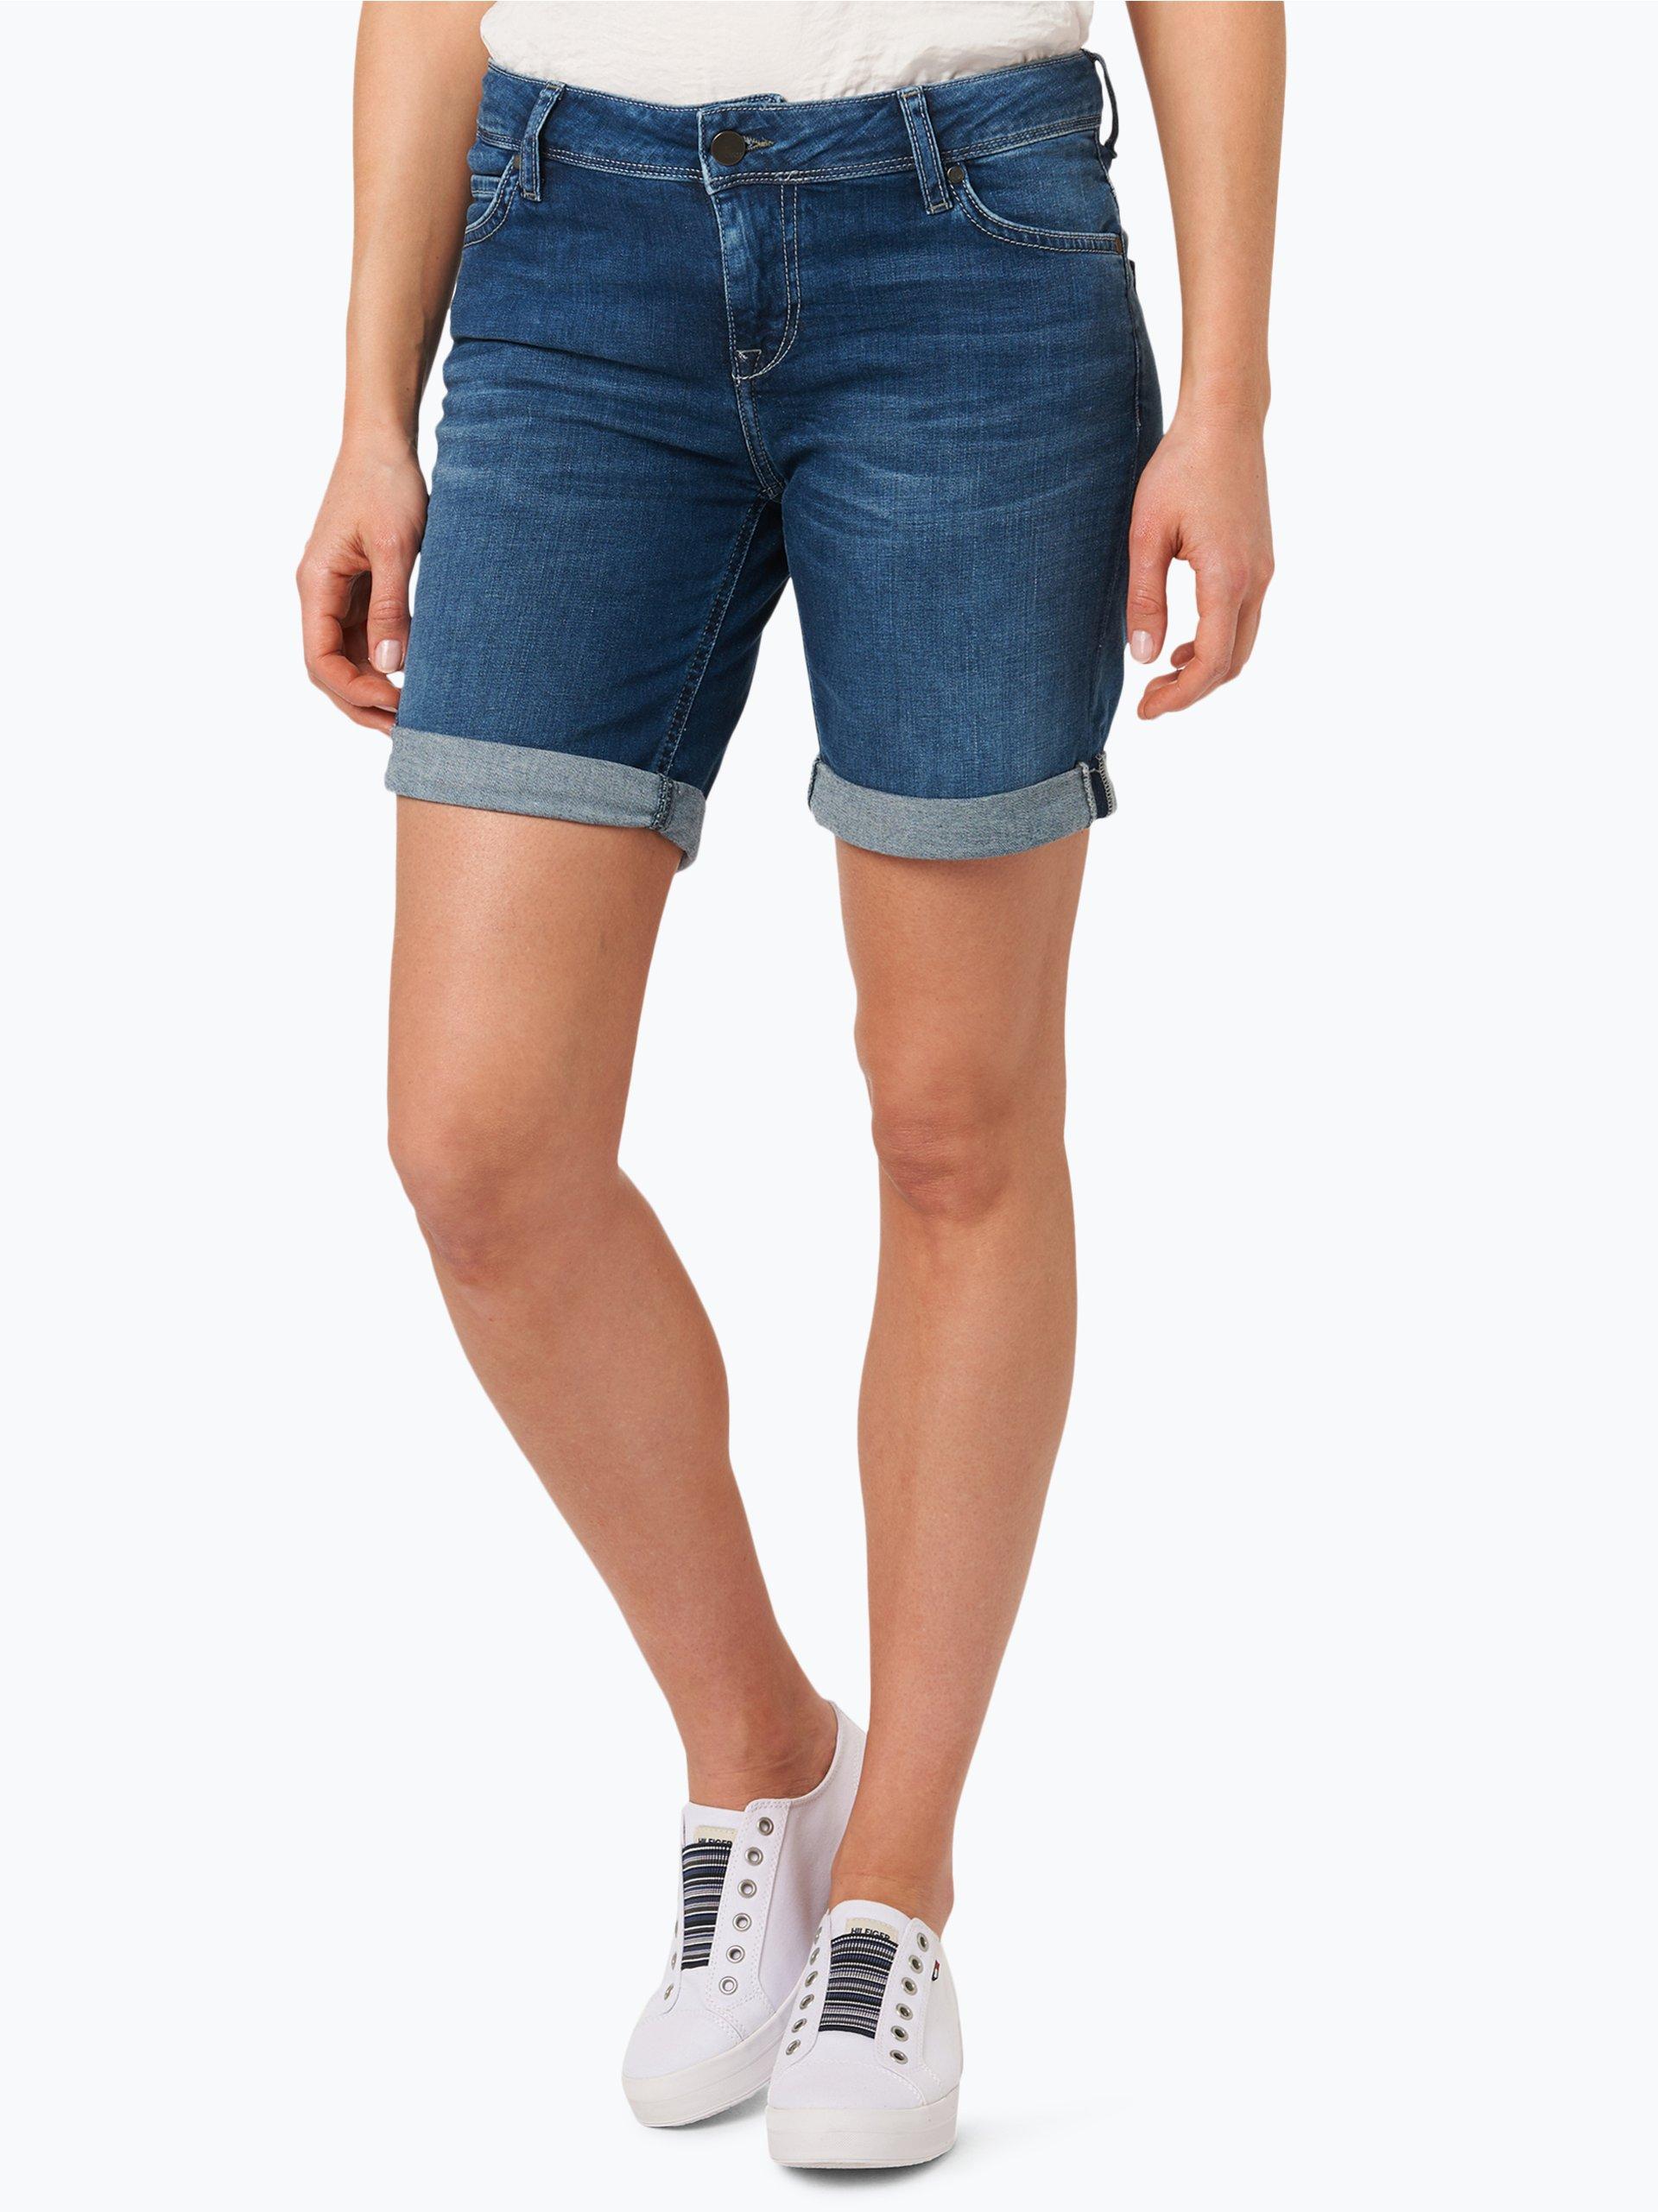 mustang damen jeans shorts bermuda medium stone uni online kaufen vangraaf com. Black Bedroom Furniture Sets. Home Design Ideas